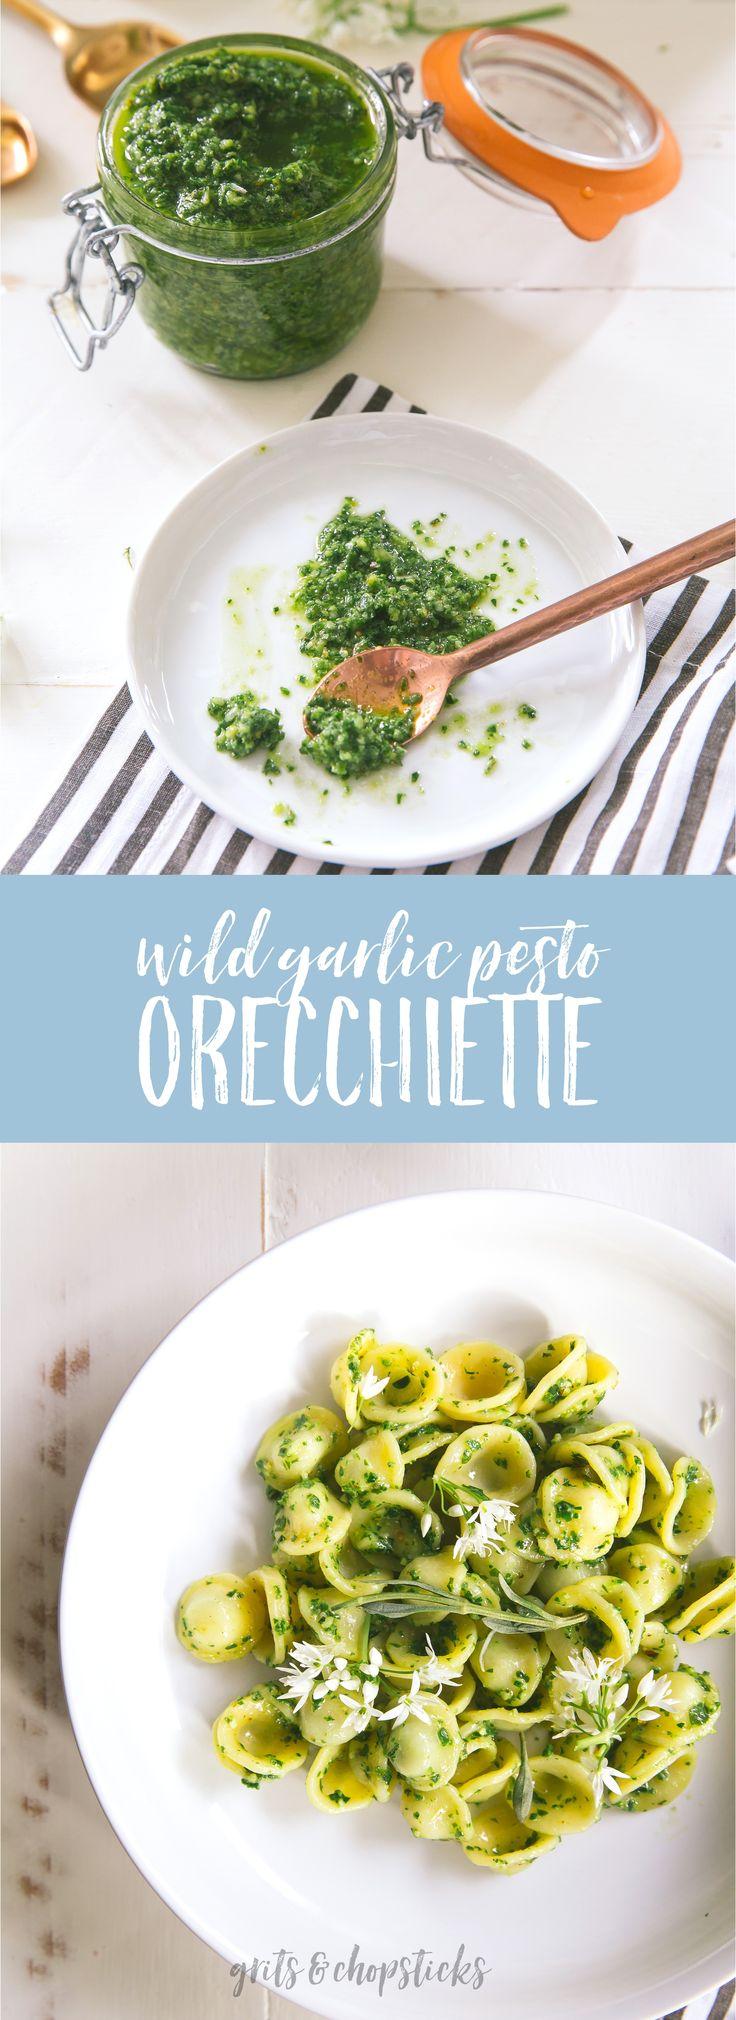 Use Seasonal Spring Ingredients To Make This Wild Garlic Pesto Orecchiette  (or Use Ramps If